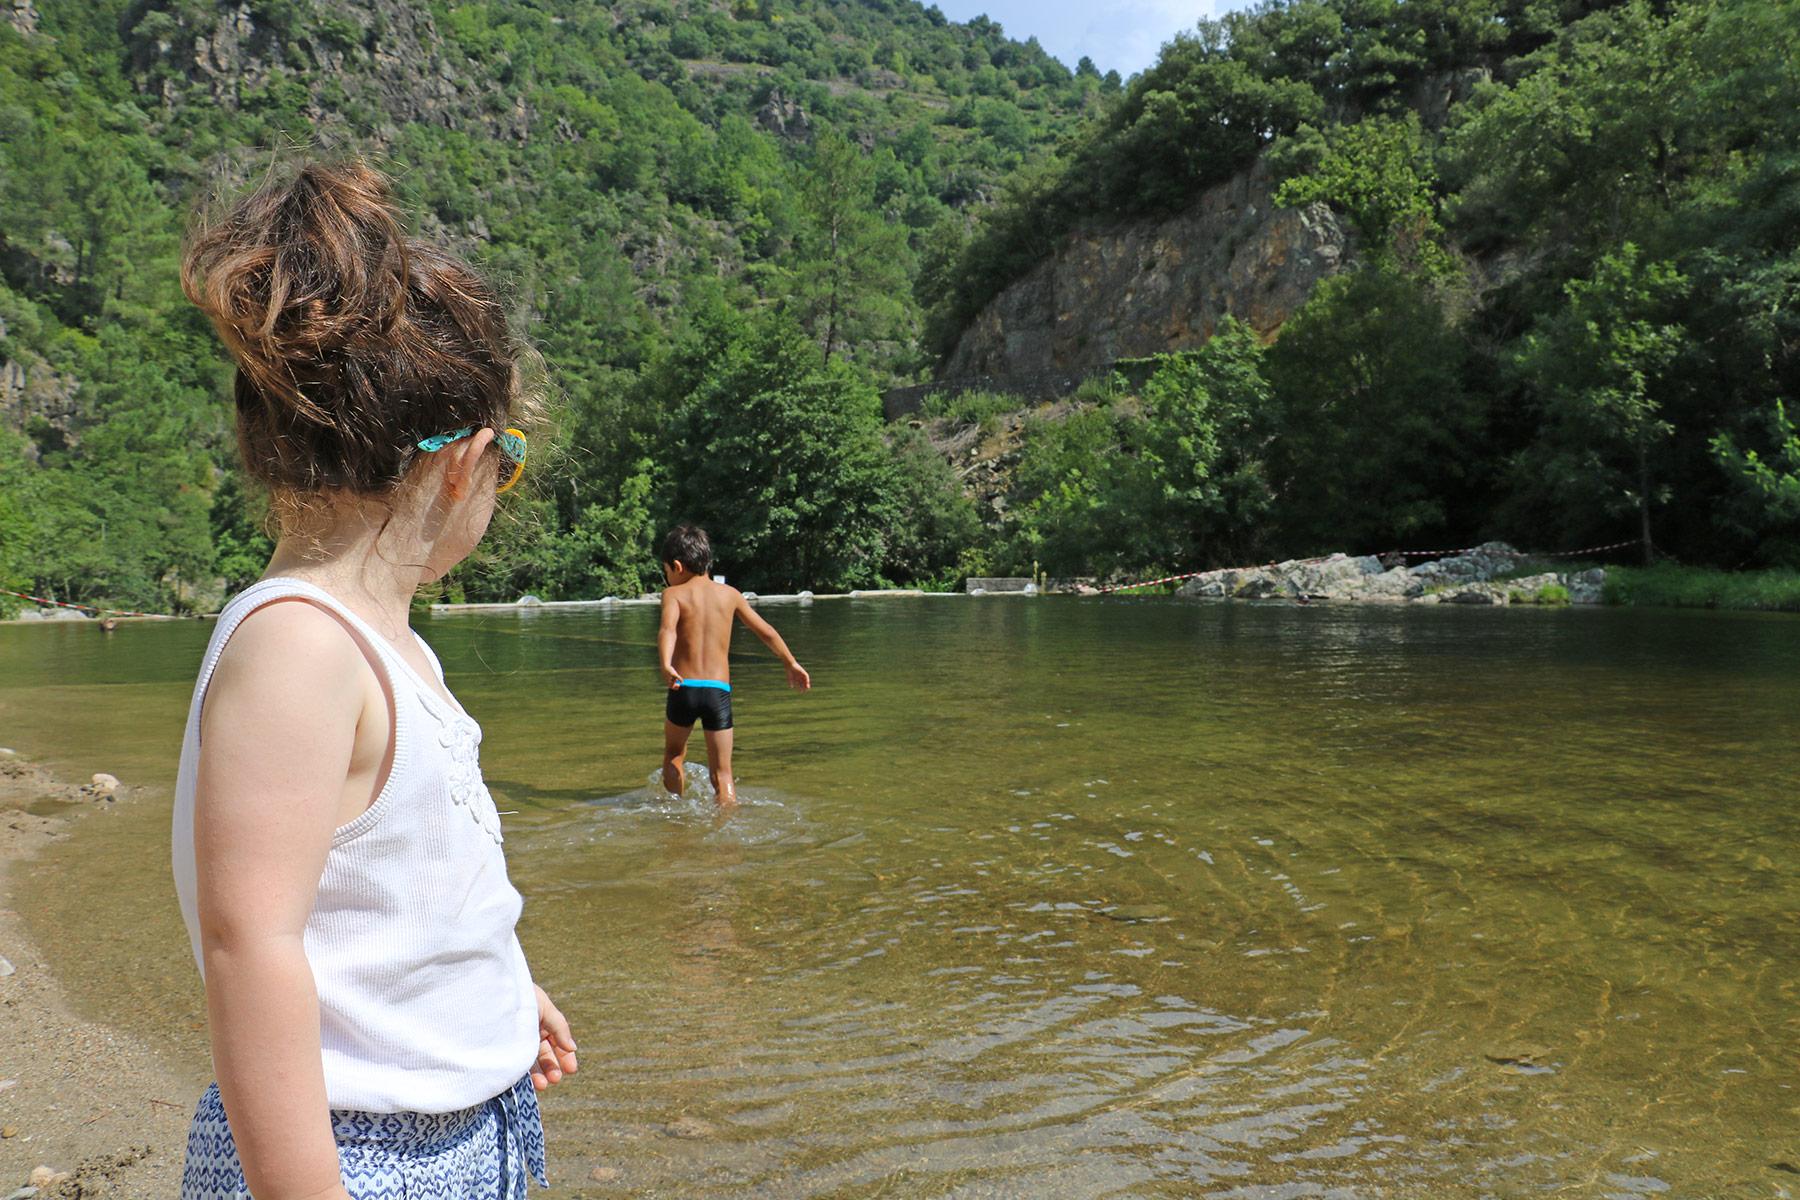 baignade-enfants-riviere-eyrieux-ardeche